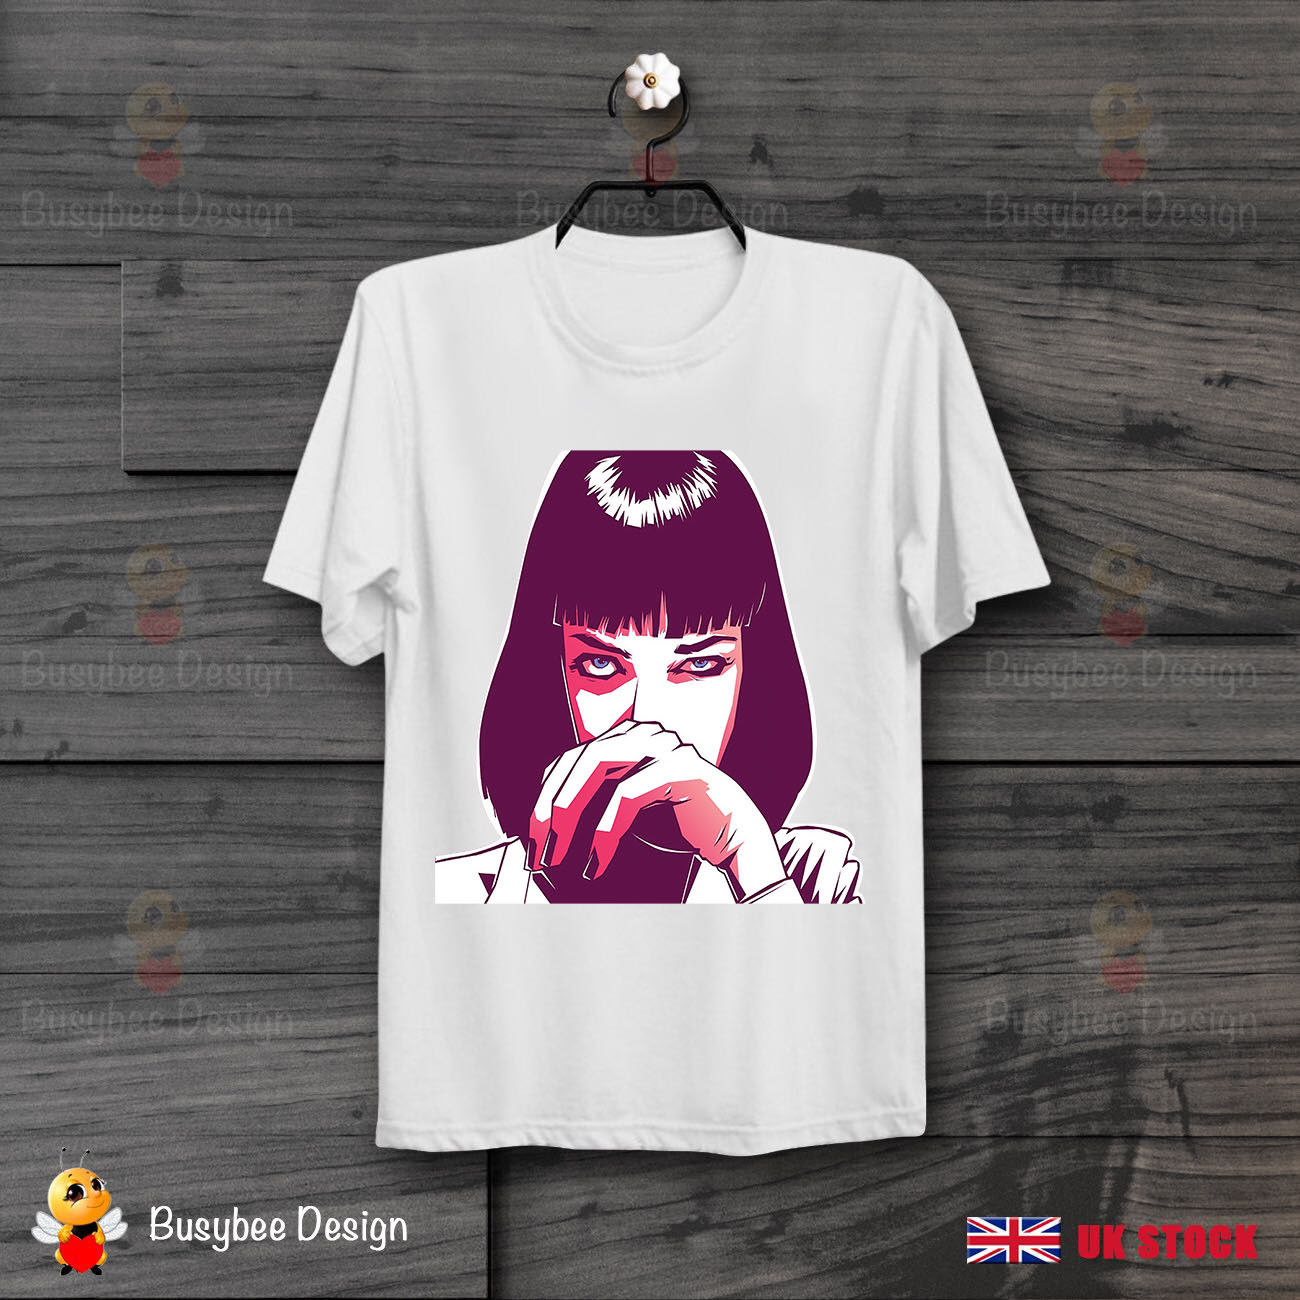 Pulp Fiction Mia Wallace Quentin Tarantino Drug Vintage Unisex T Shirt B113